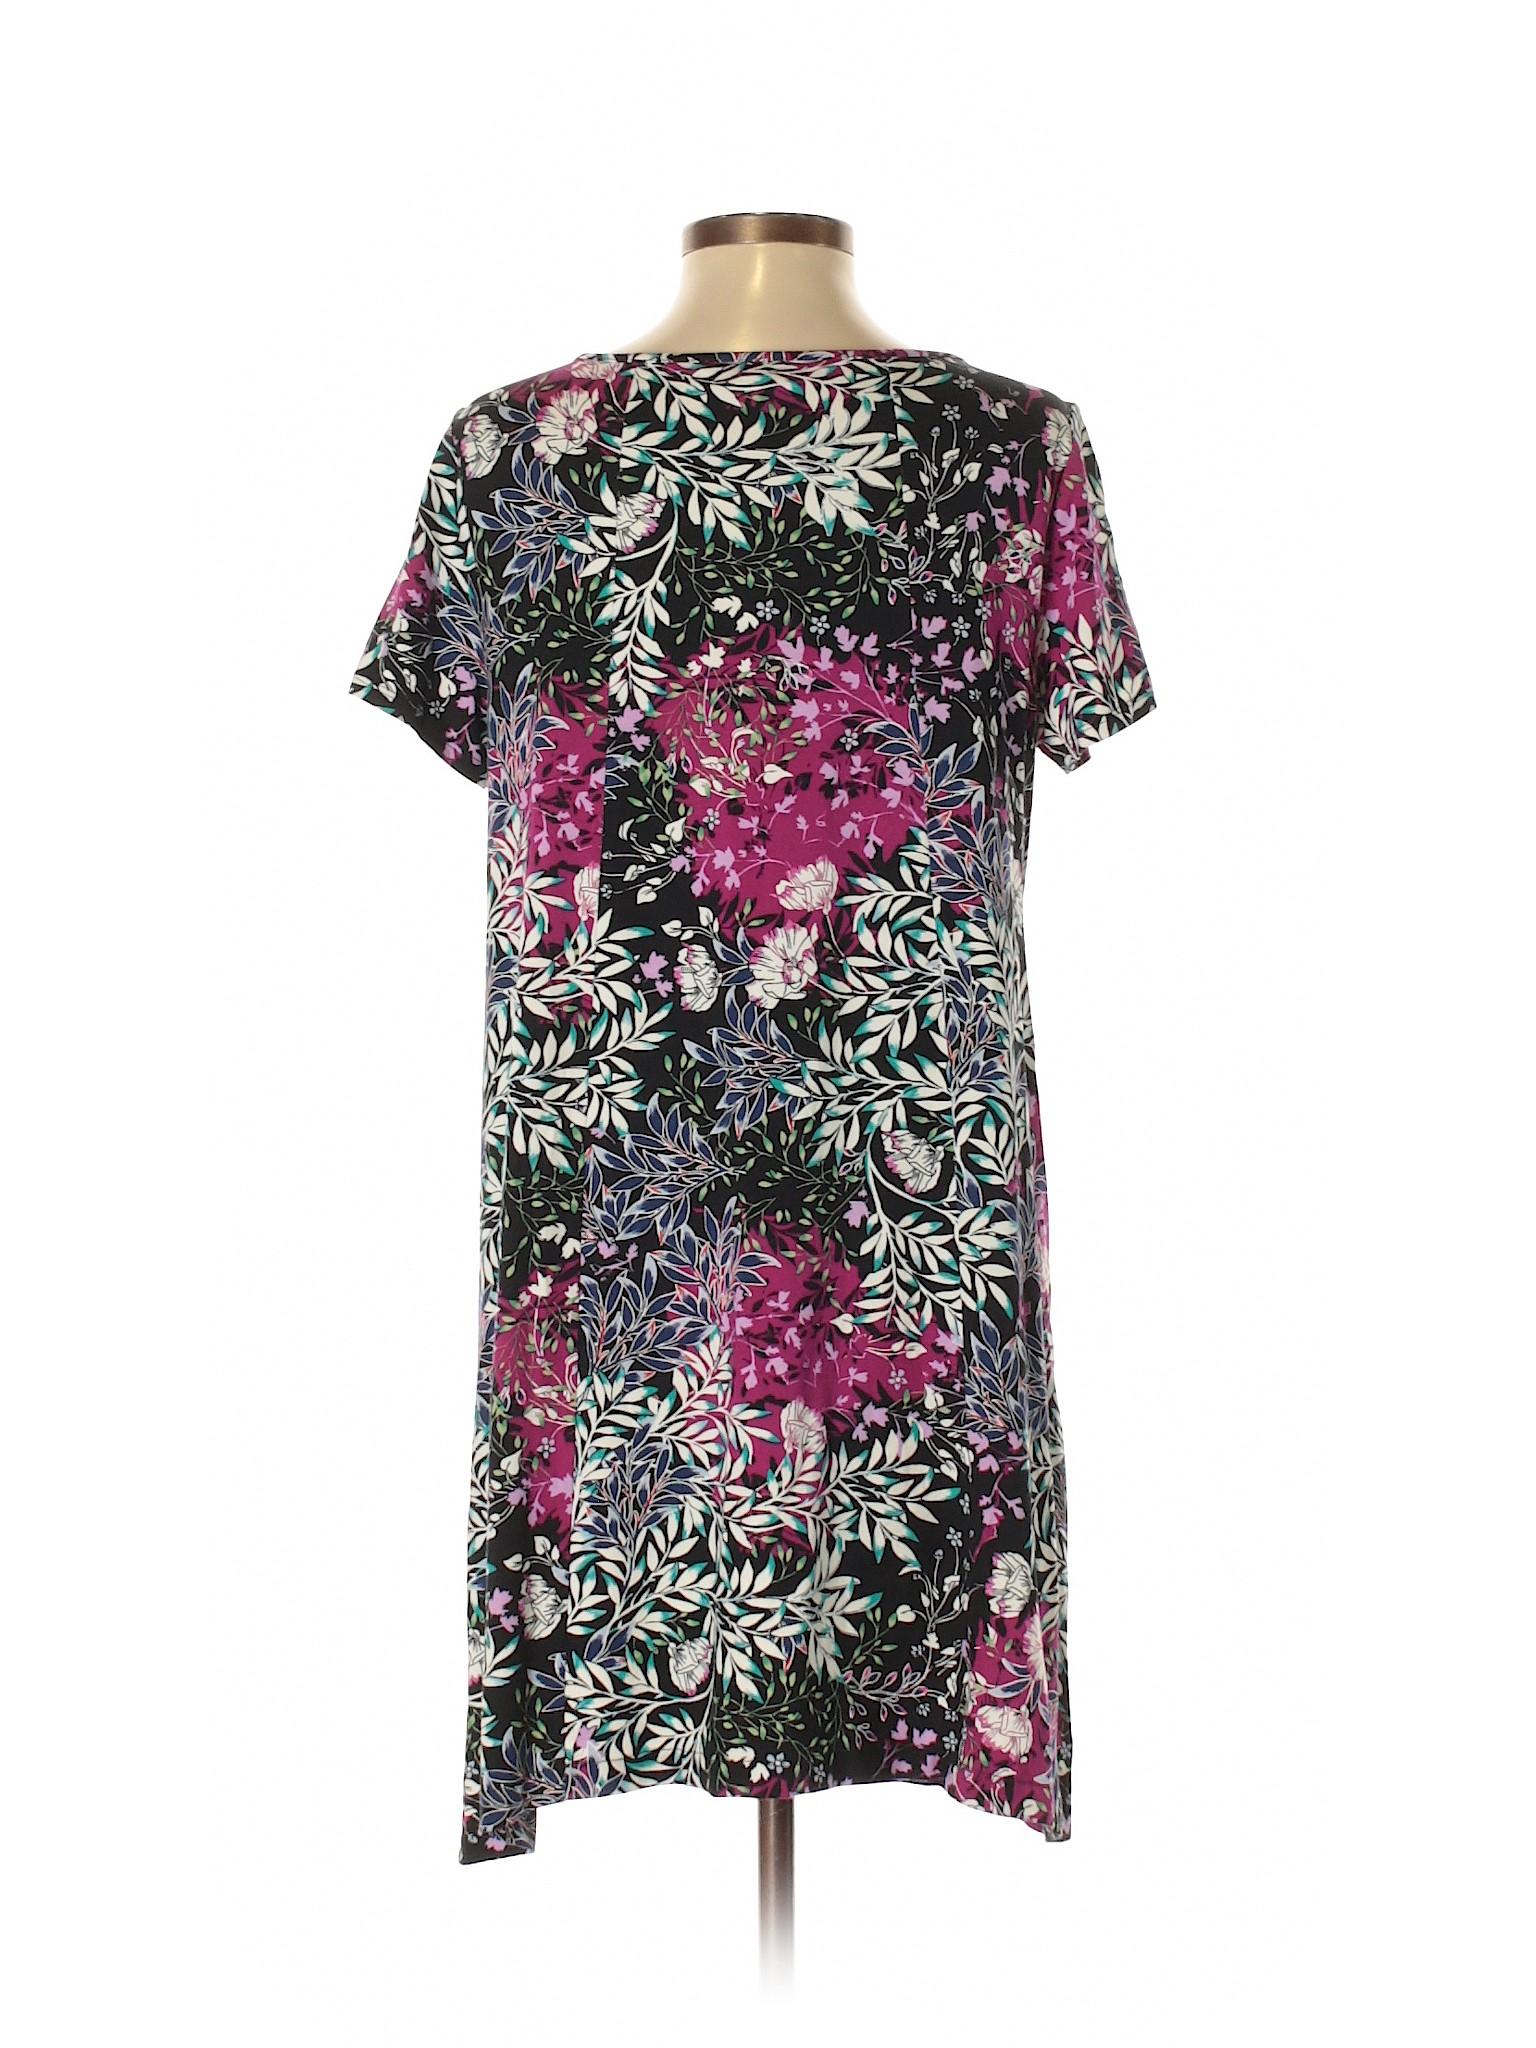 Boutique J Dress Casual jill winter HgqwrxHT